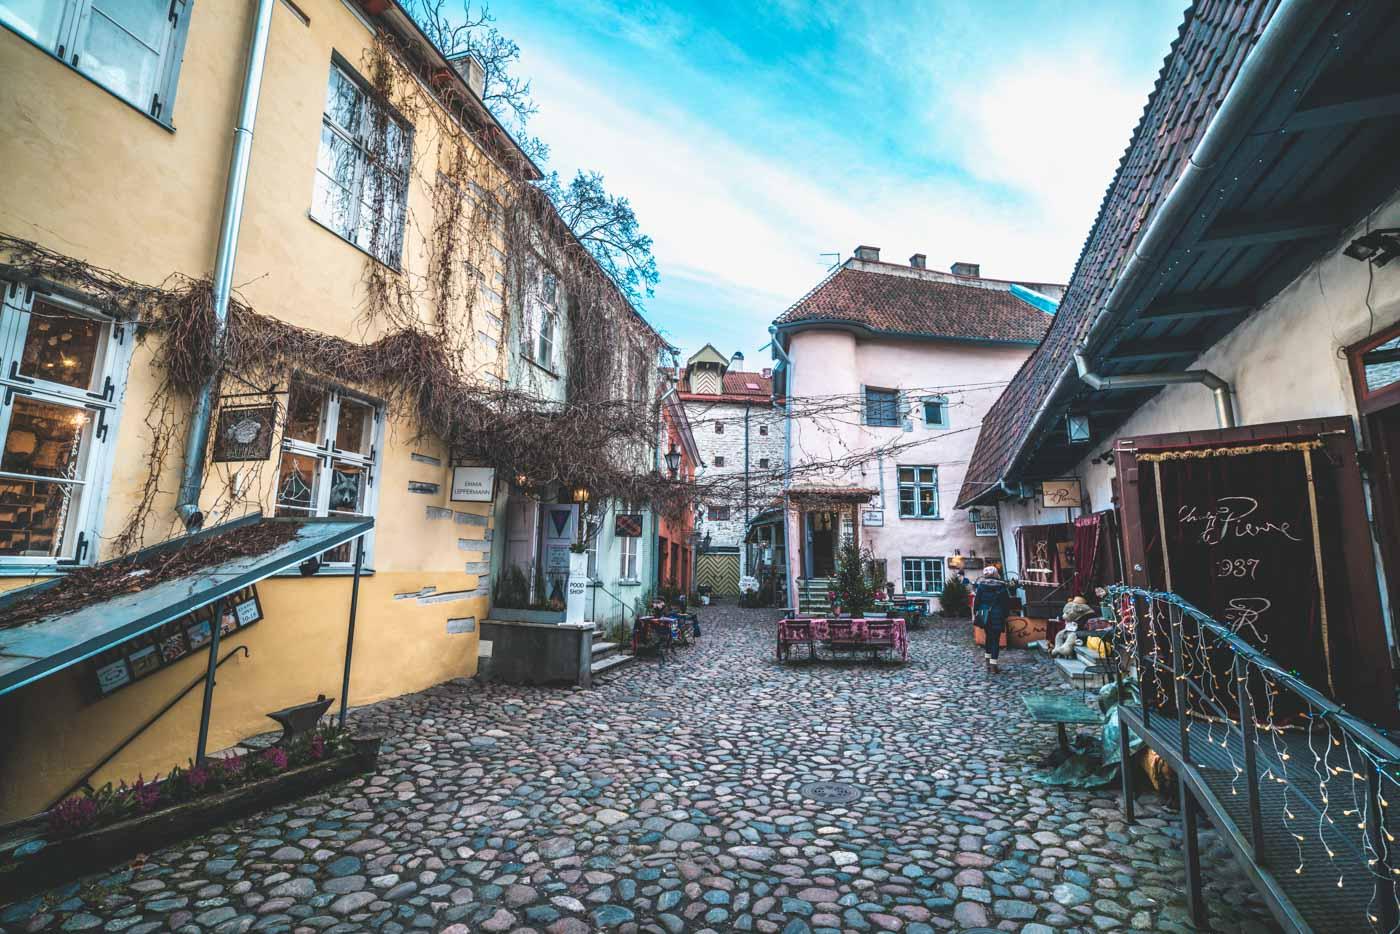 Master's Courtyard, Old Town, Tallinn